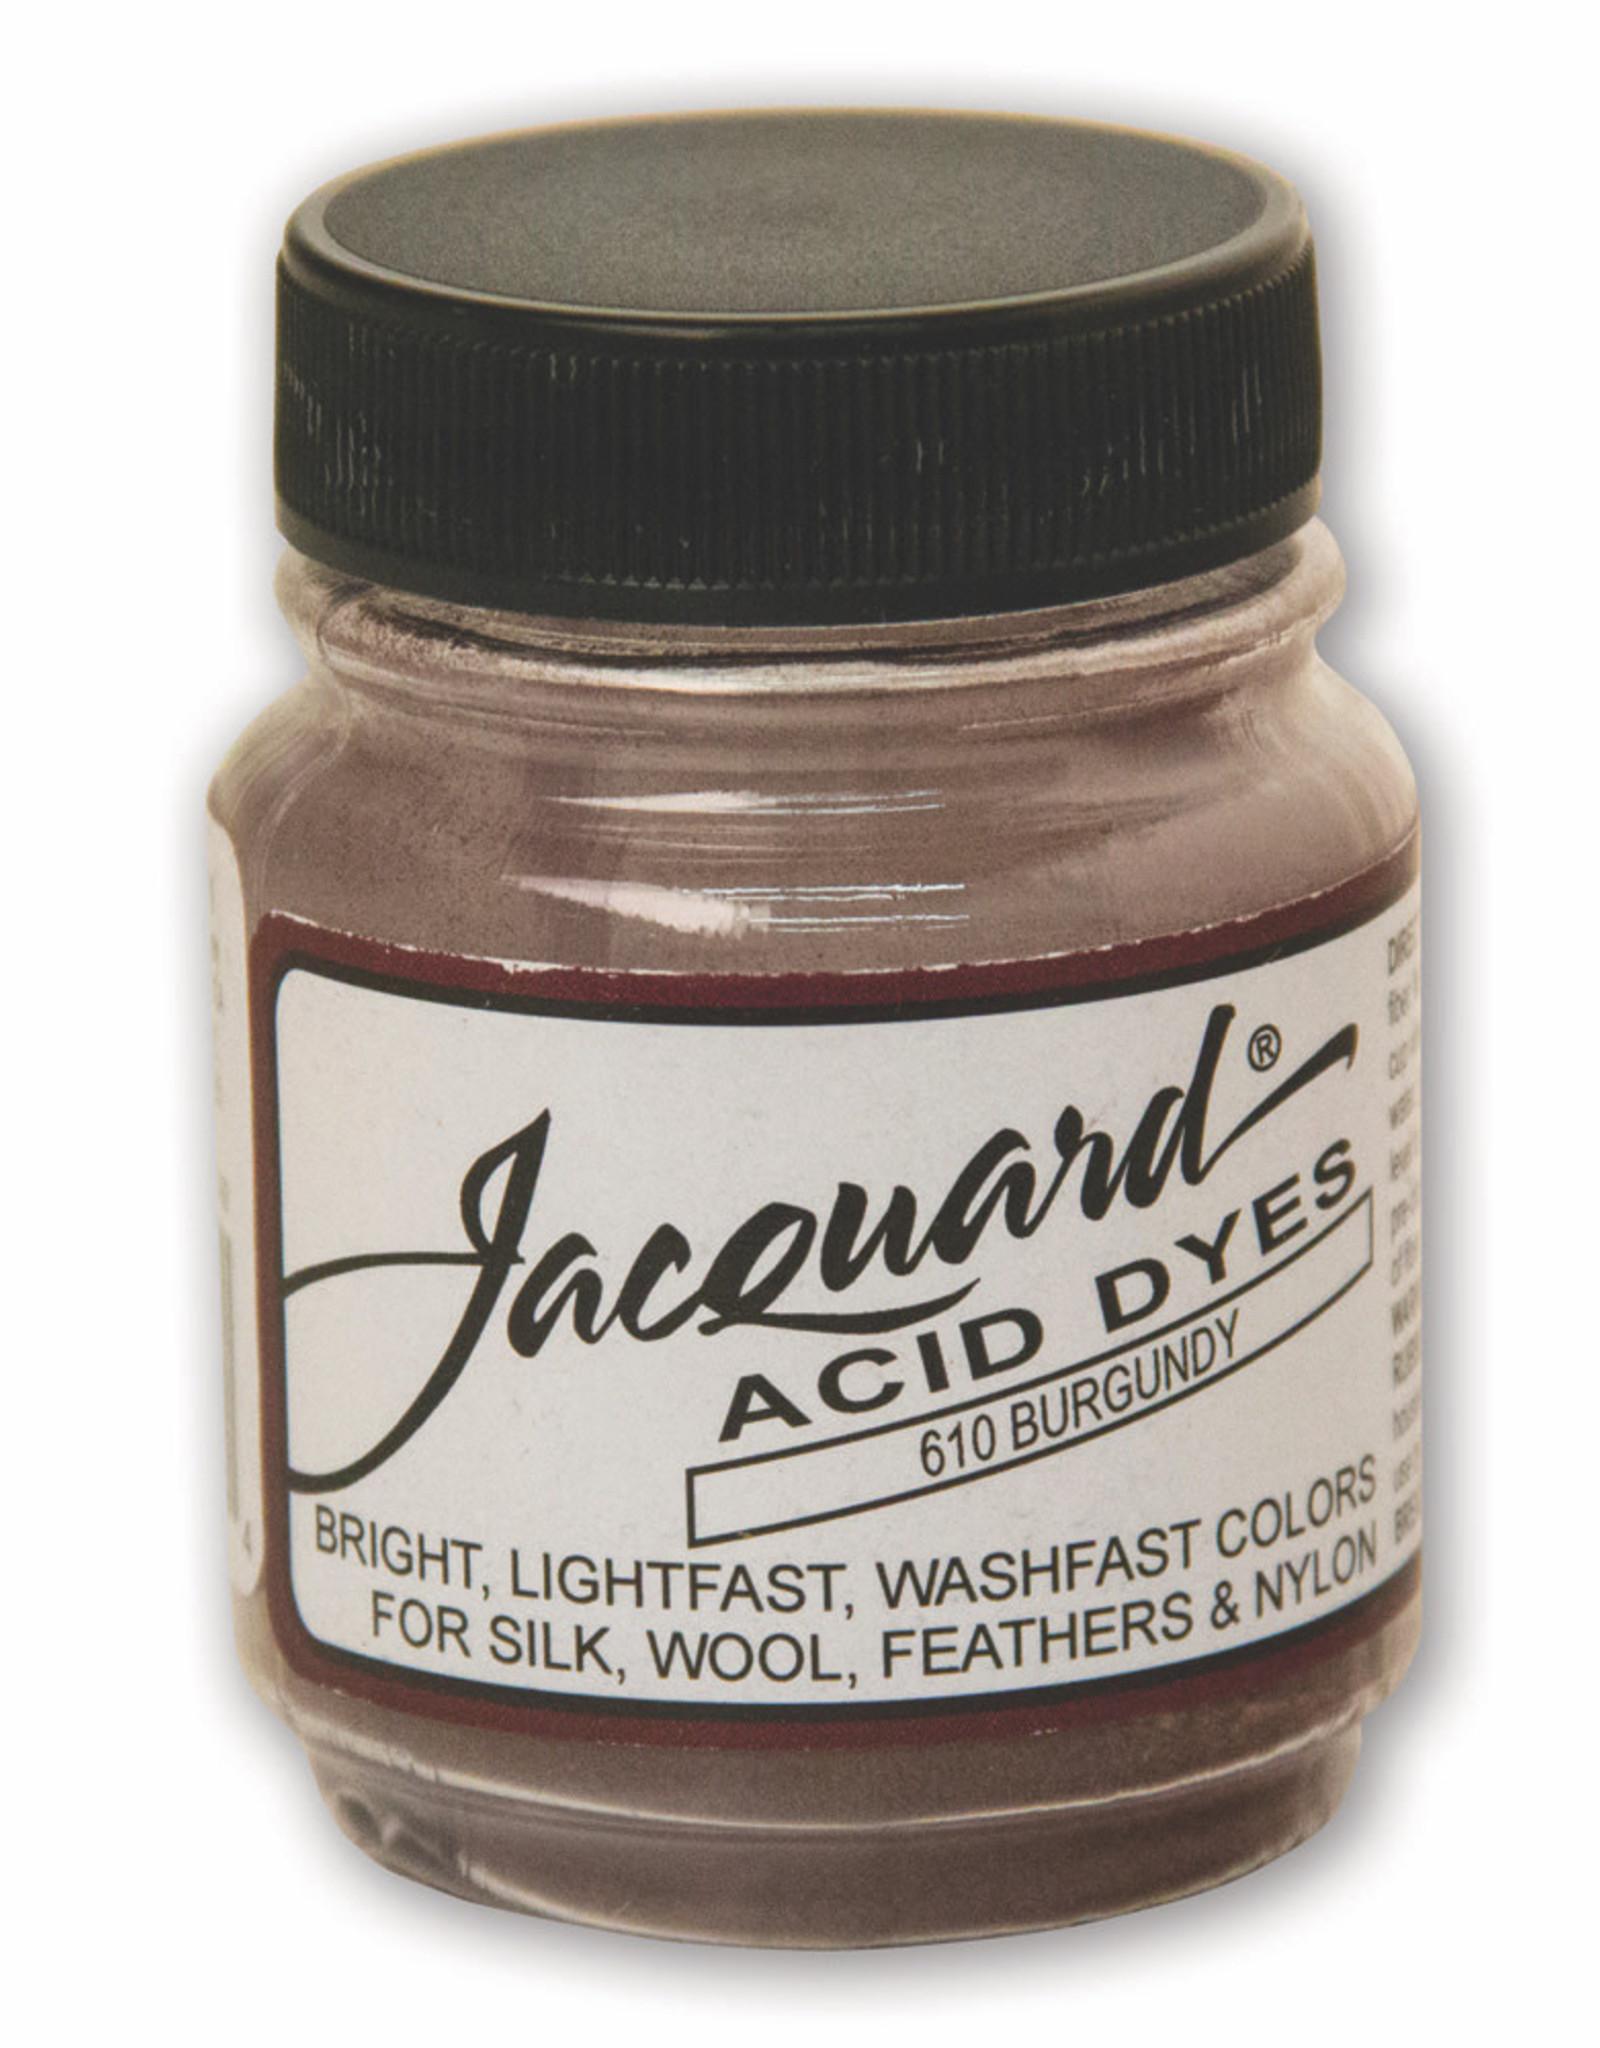 Jacquard Jacquard Acid Dye #610 Burgundy 1/2oz